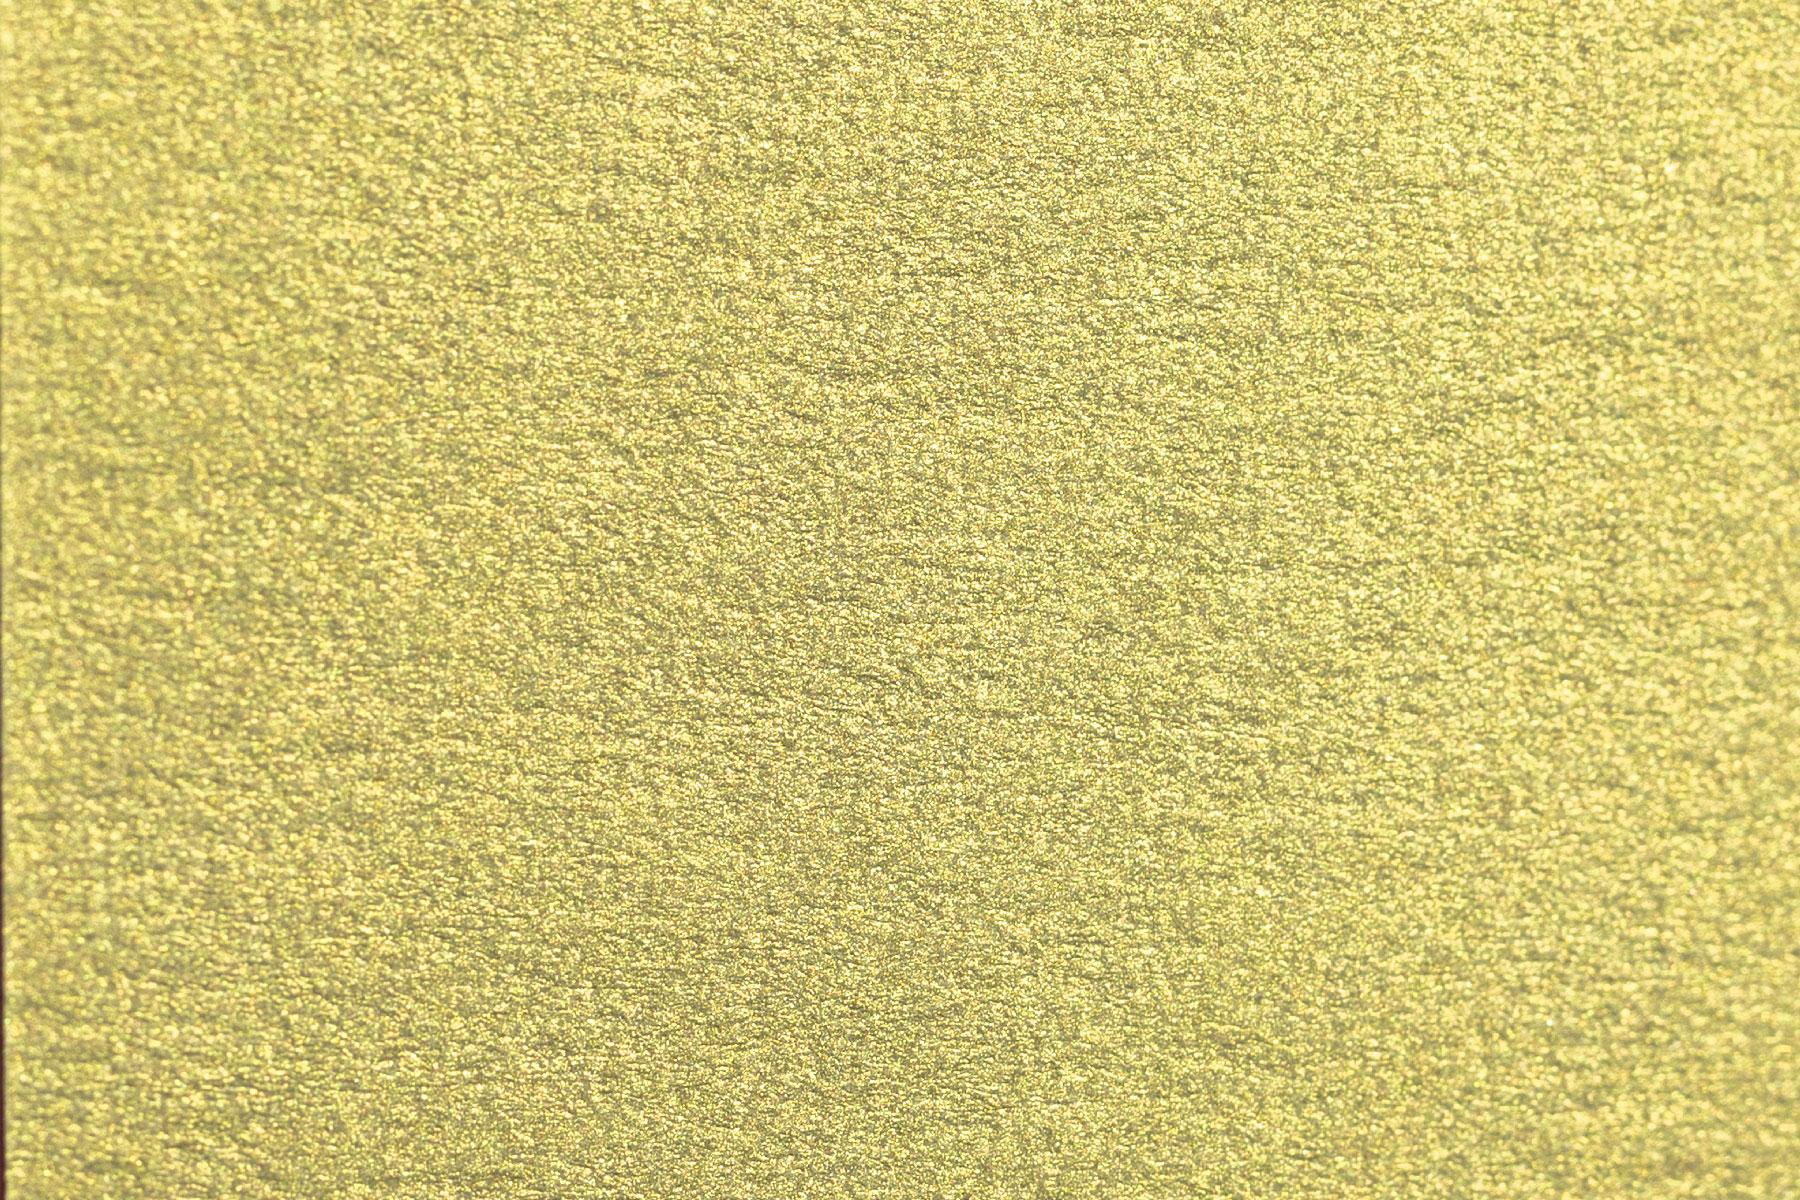 CURIOUS Gold Leaf 300 гр.